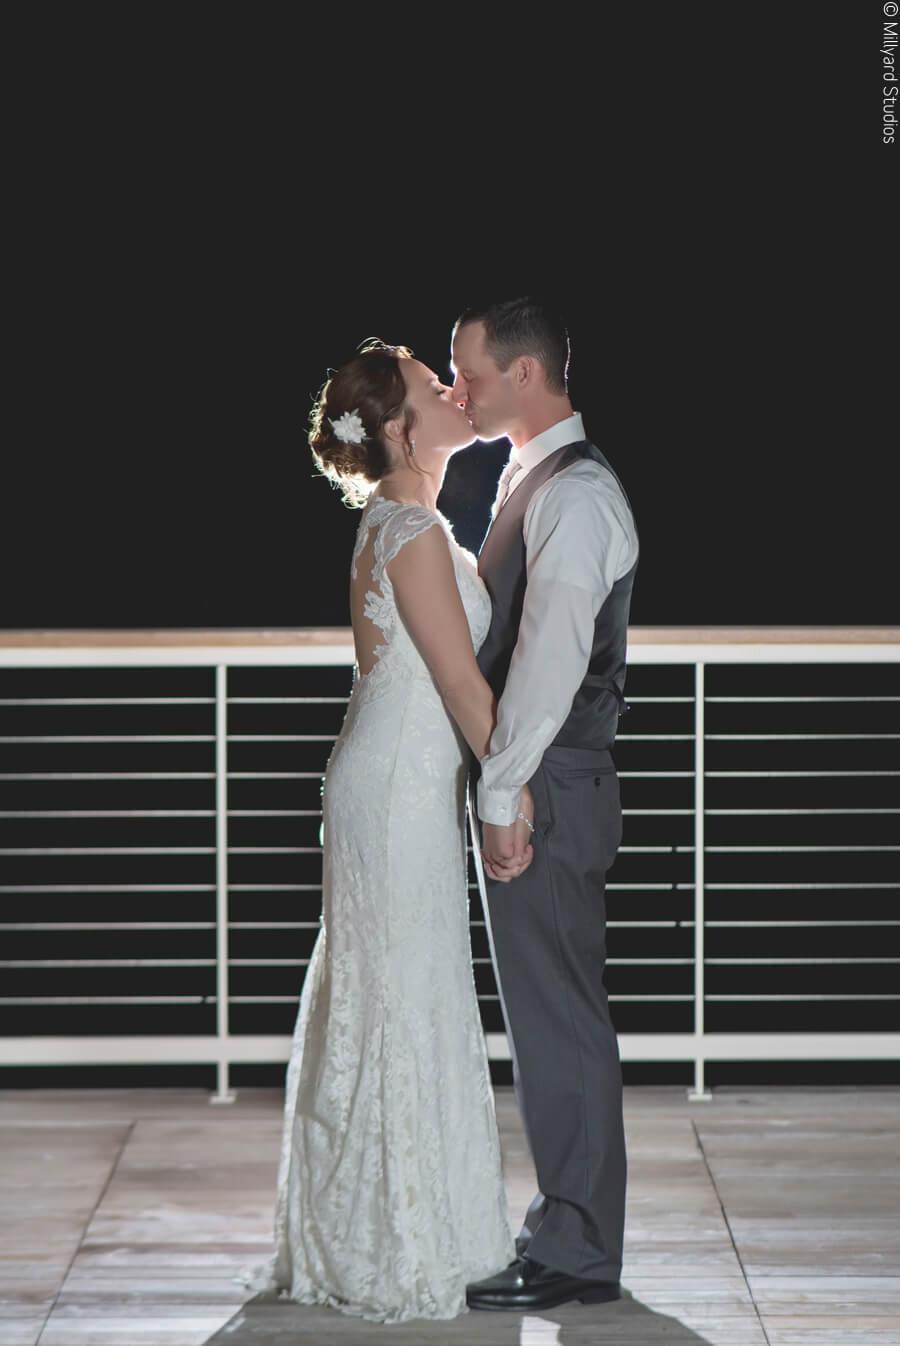 NH Wedding Photographer Millyard Studios Amanda Amp Mike Beauport Hotel